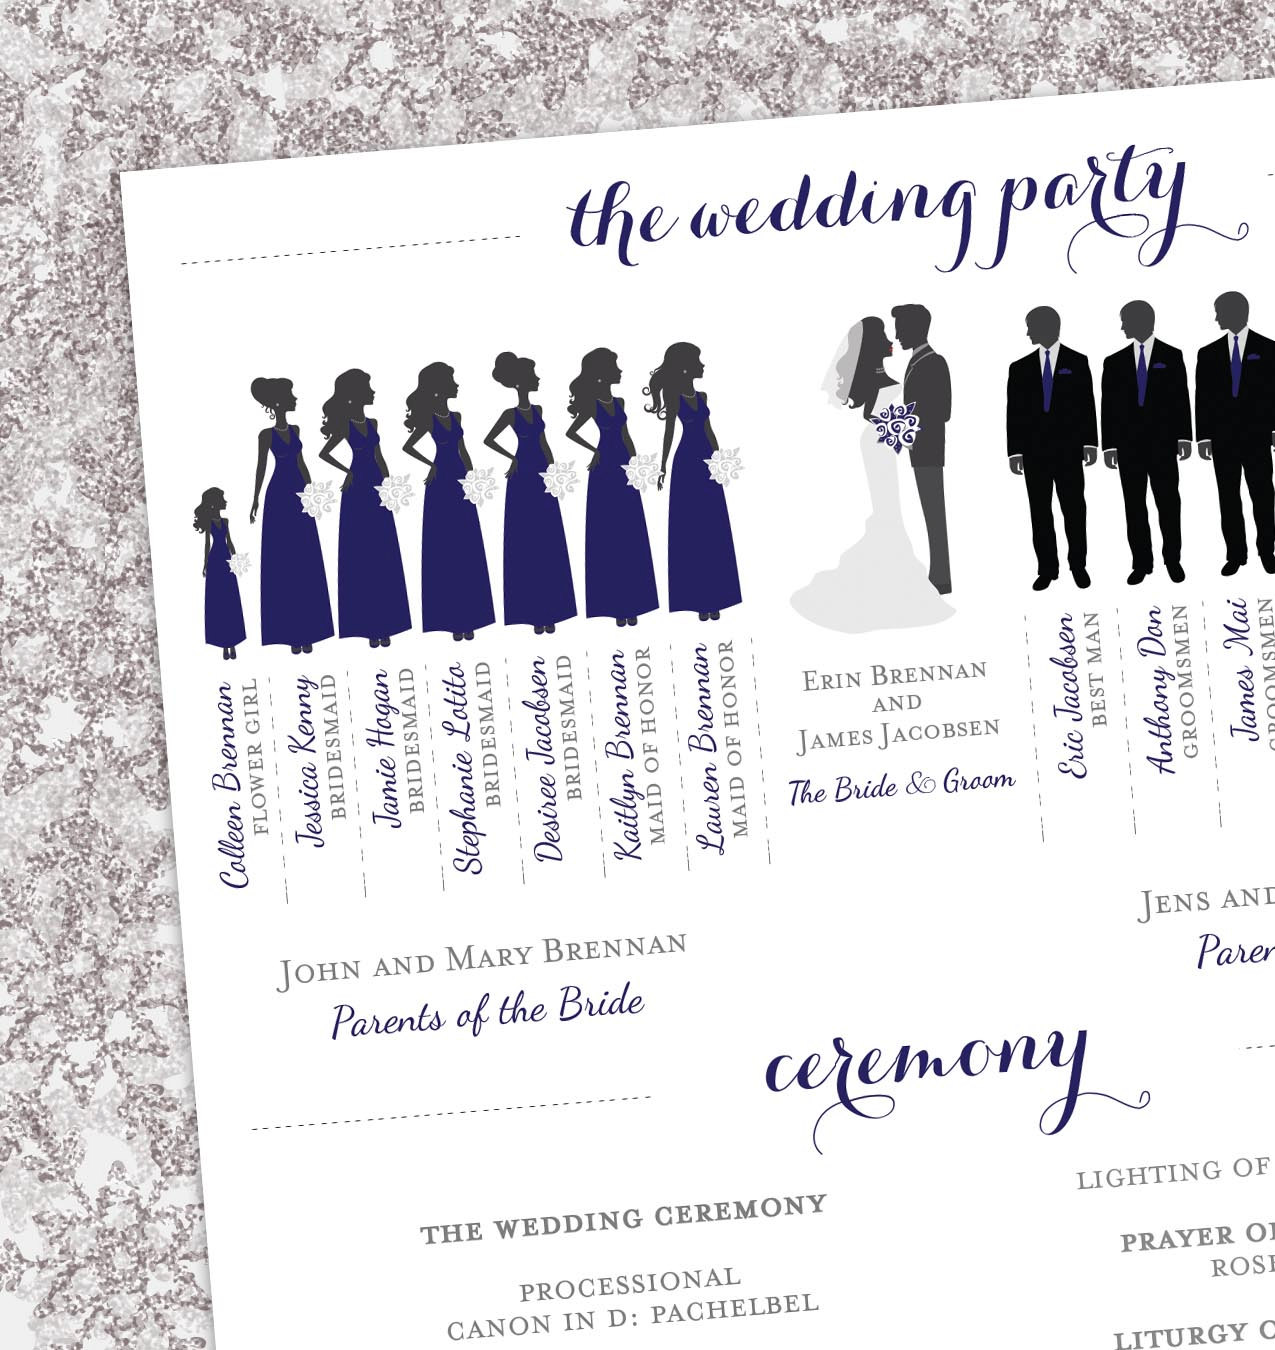 Wedding Party Silhouette Clip Art Program.